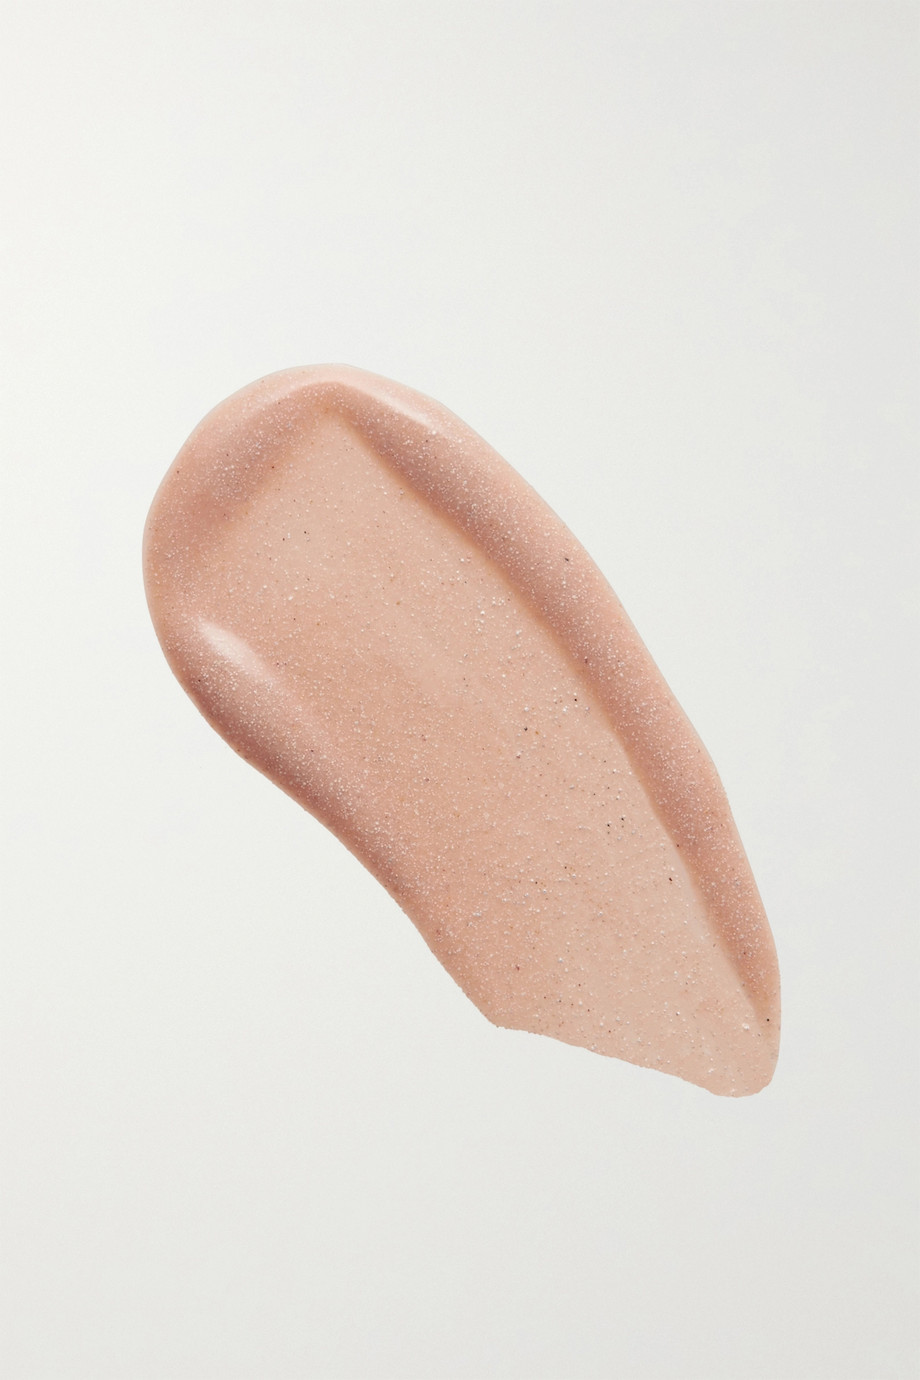 Charlotte Tilbury Crème hydratante teintée unisexe Healthy Glow, 40 ml